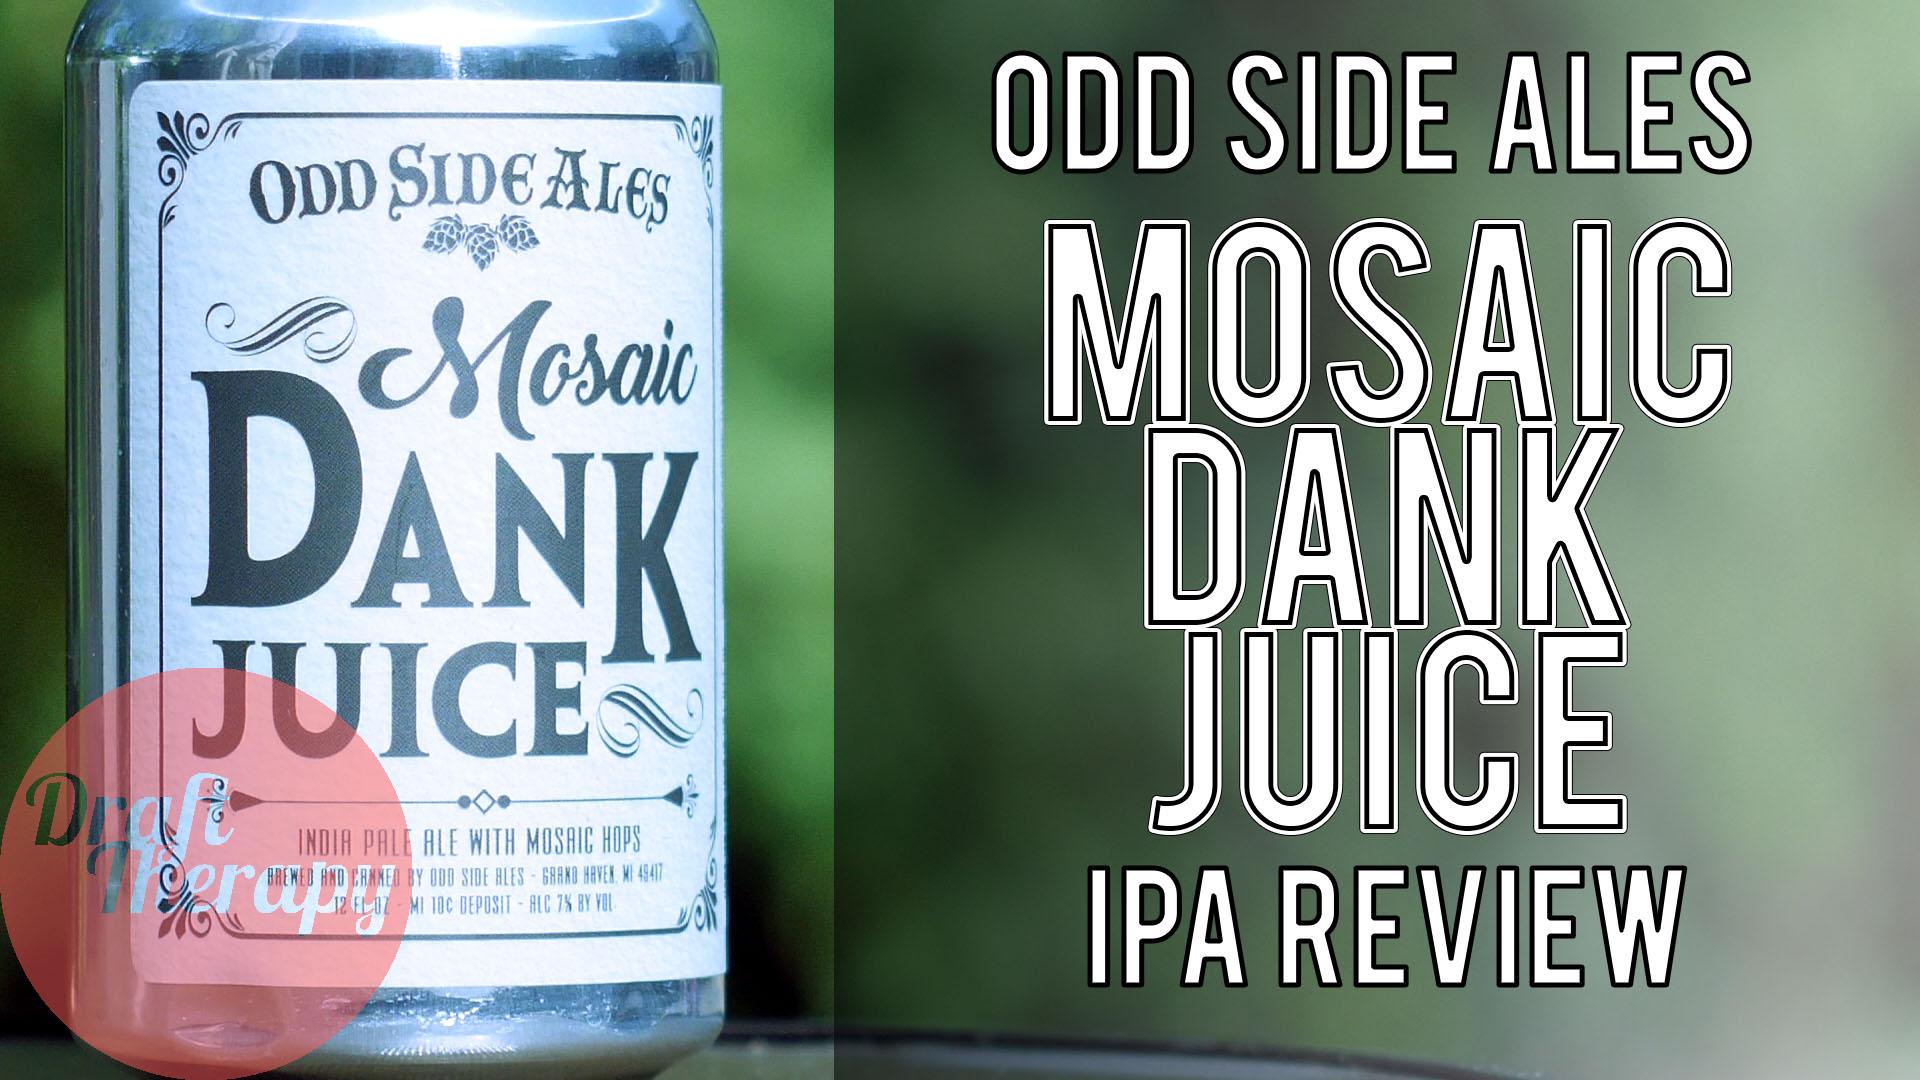 Odd Side Ales – Mosaic Dank Juice Review